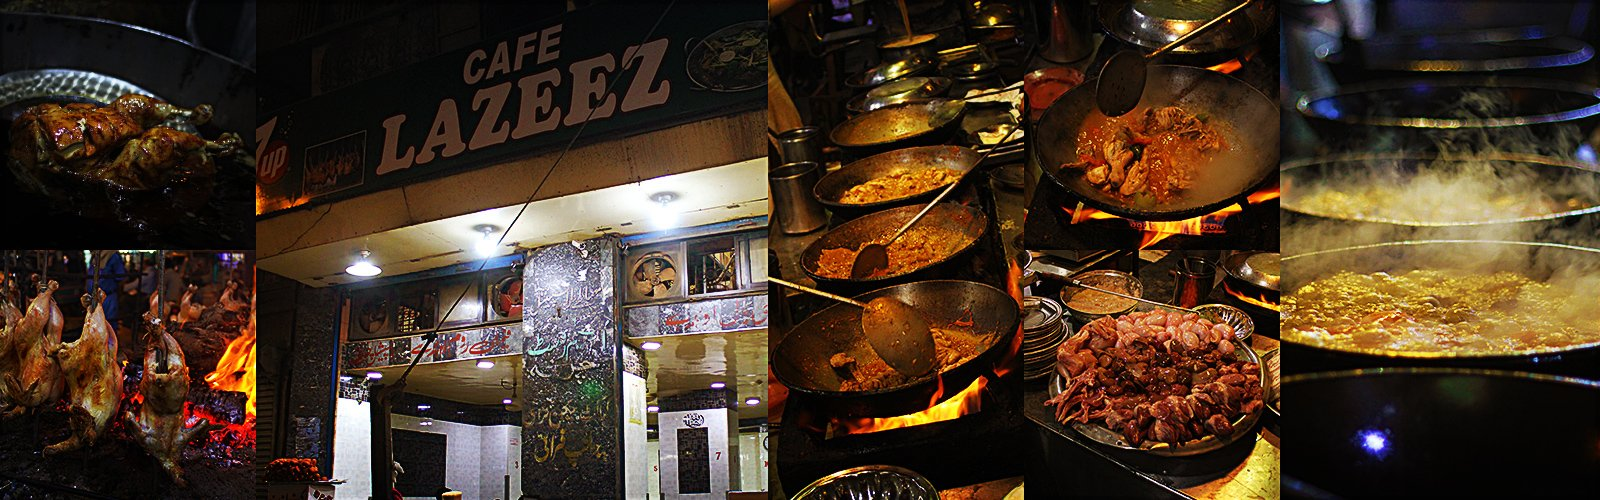 Café Lazeez: A savoury half century! - The News International